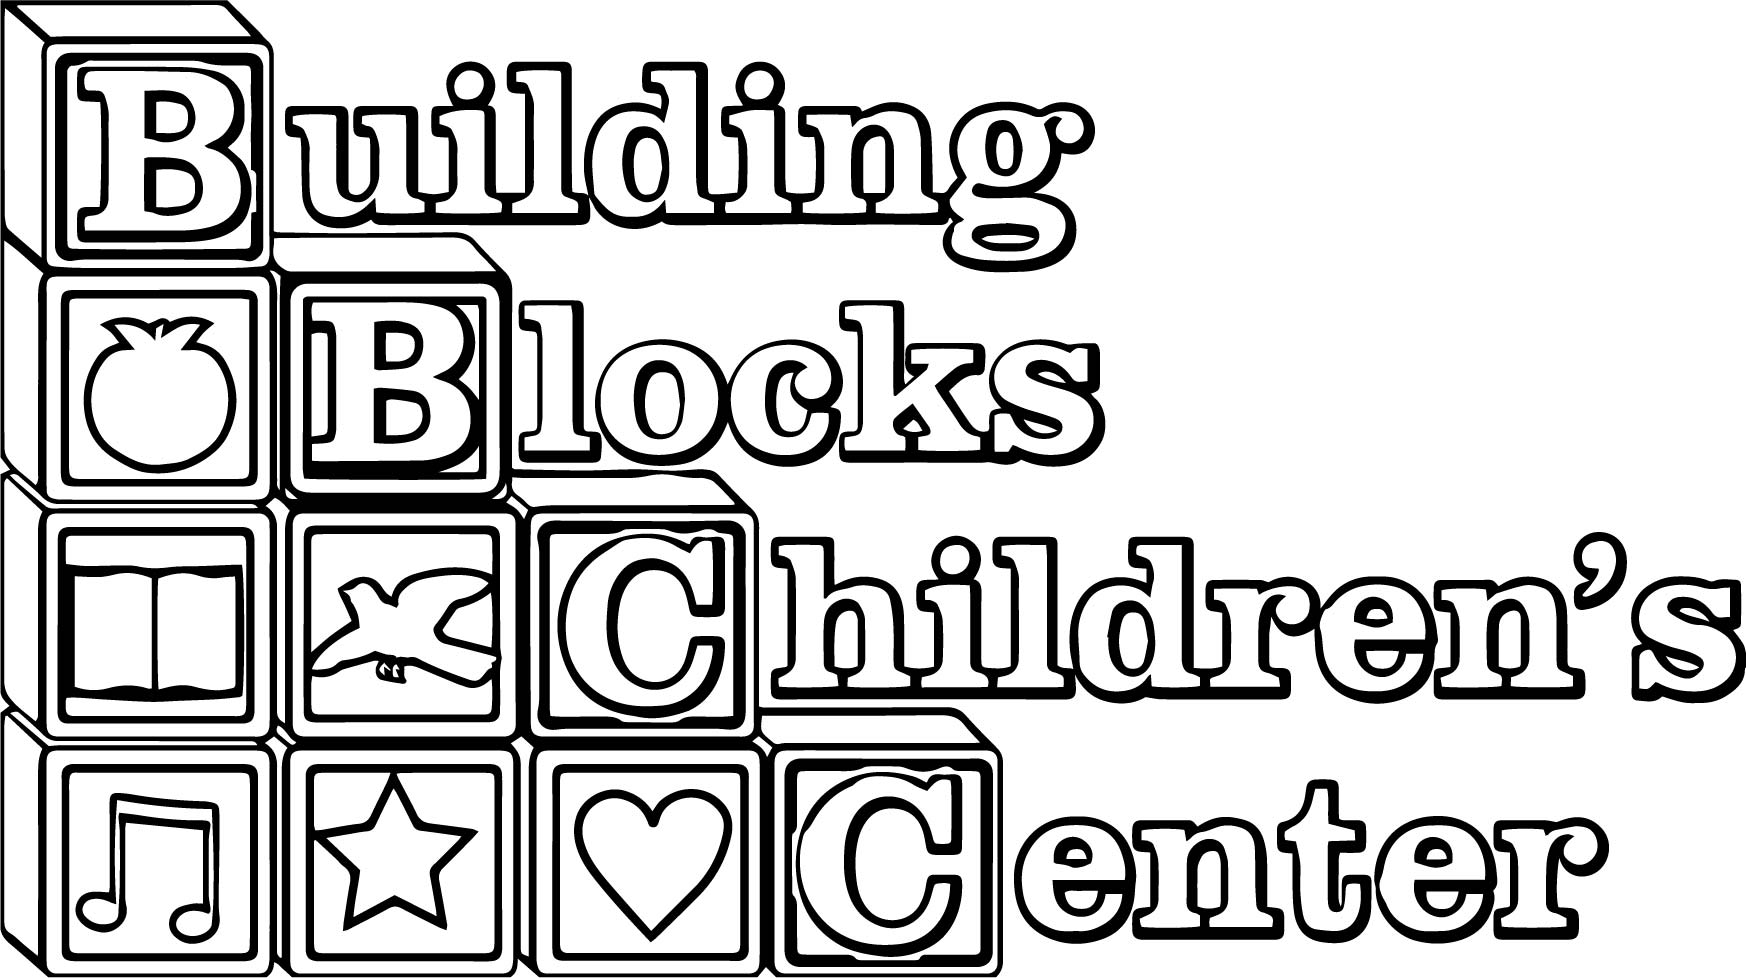 Building Blocks Children Center Coloring Page